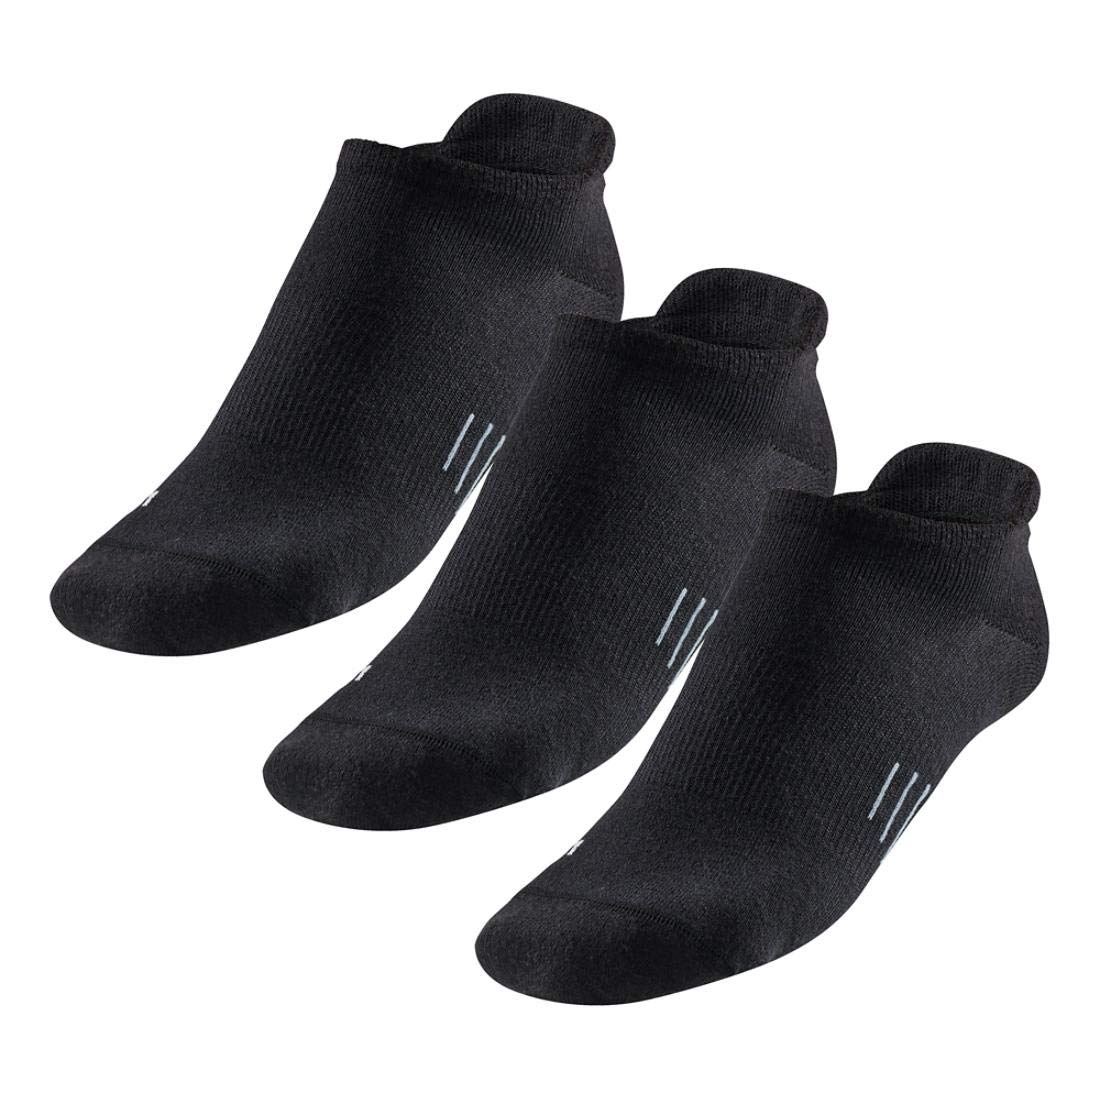 R-Gear Women's No Show Running Socks (3-Pack) | Super Femme, Super Cute, Super Dry, Black/Thin, S/M